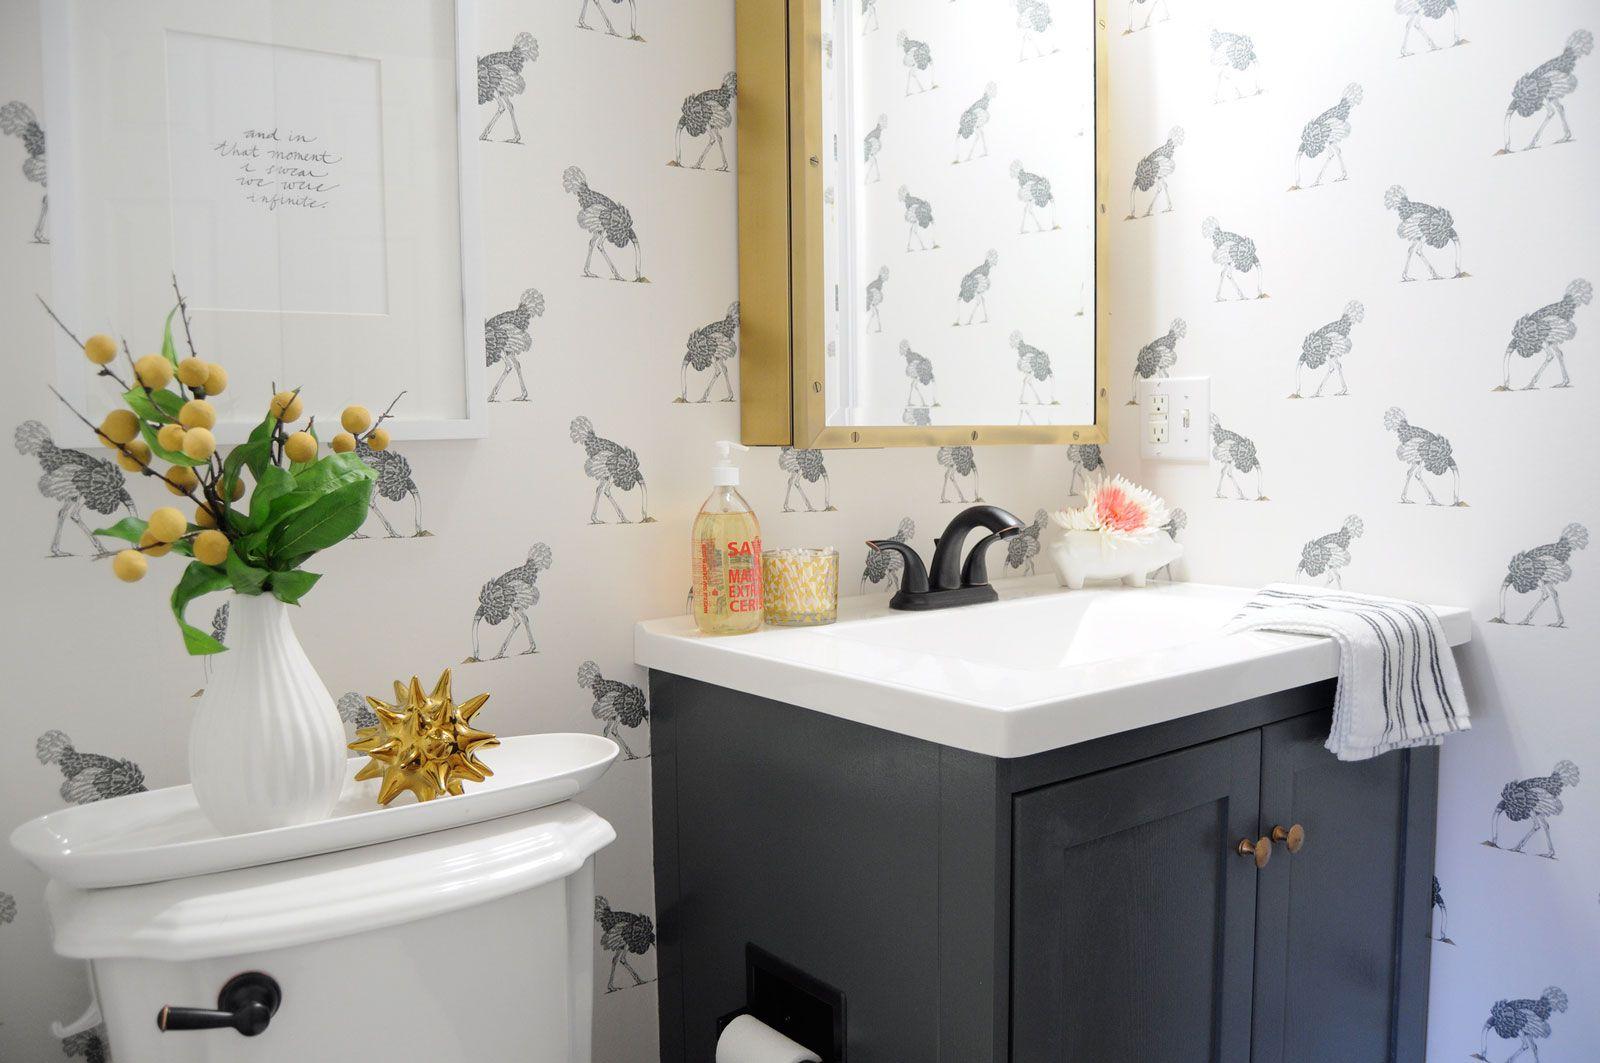 Flamingo bathroom decor - Bathroom Ideas